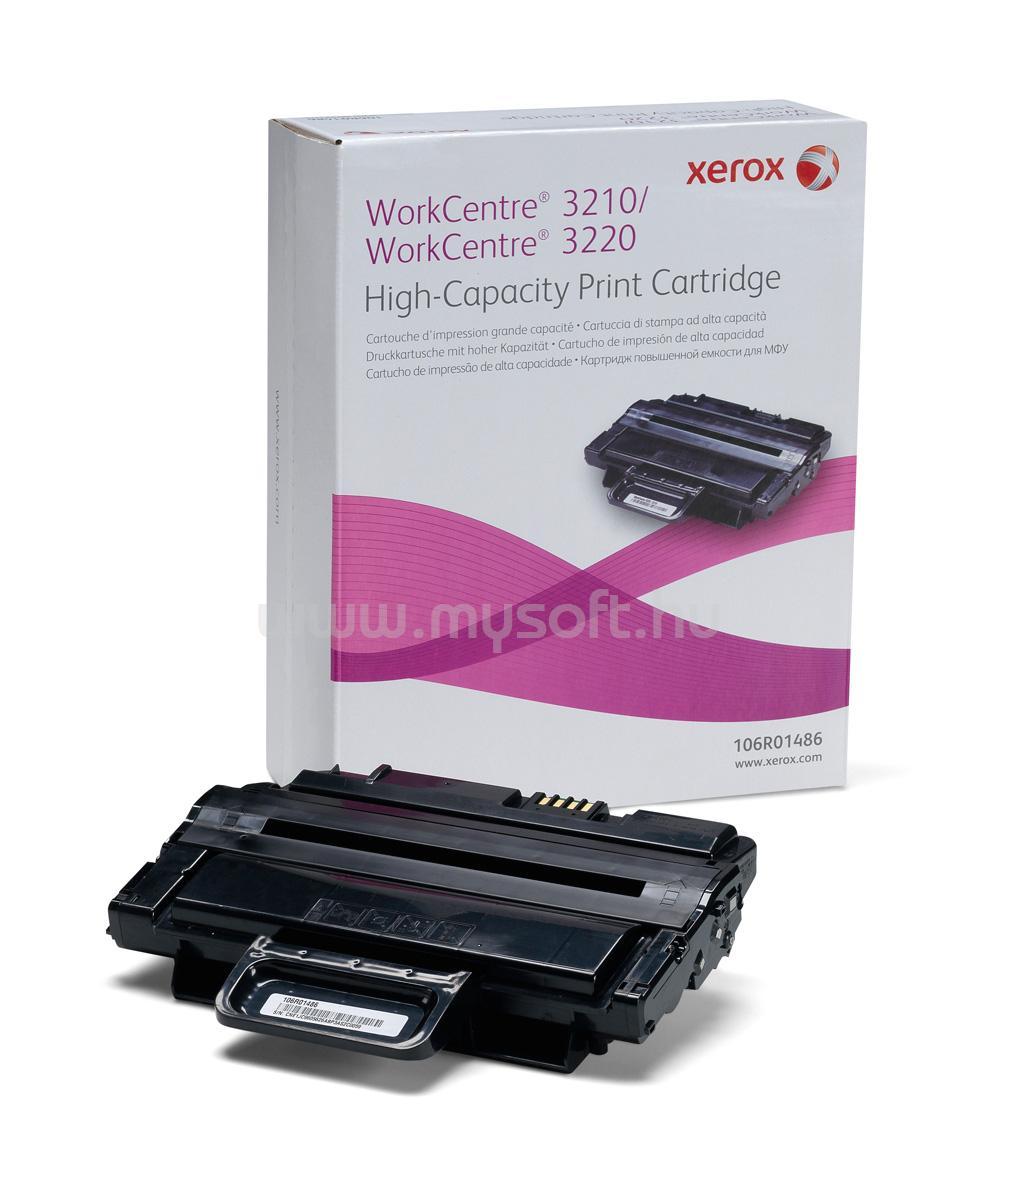 XEROX Toner WorkCentre 3210/3220 MFP Fekete 4100 oldal